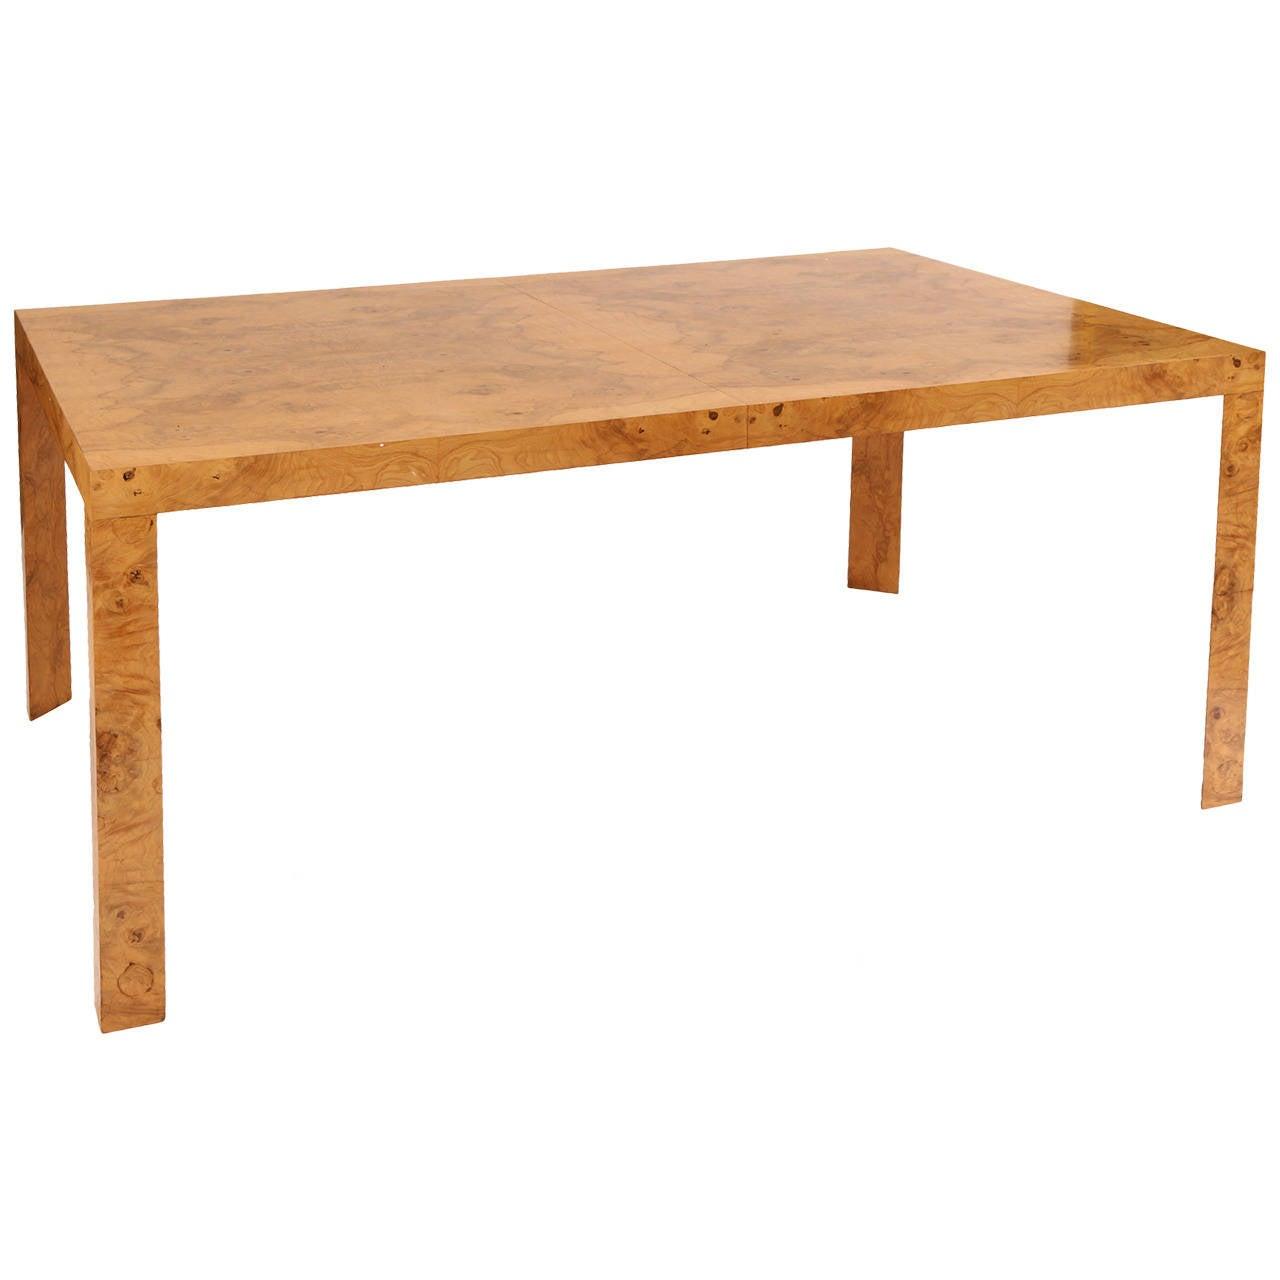 Edward wormley for dunbar burl wood dining table at stdibs